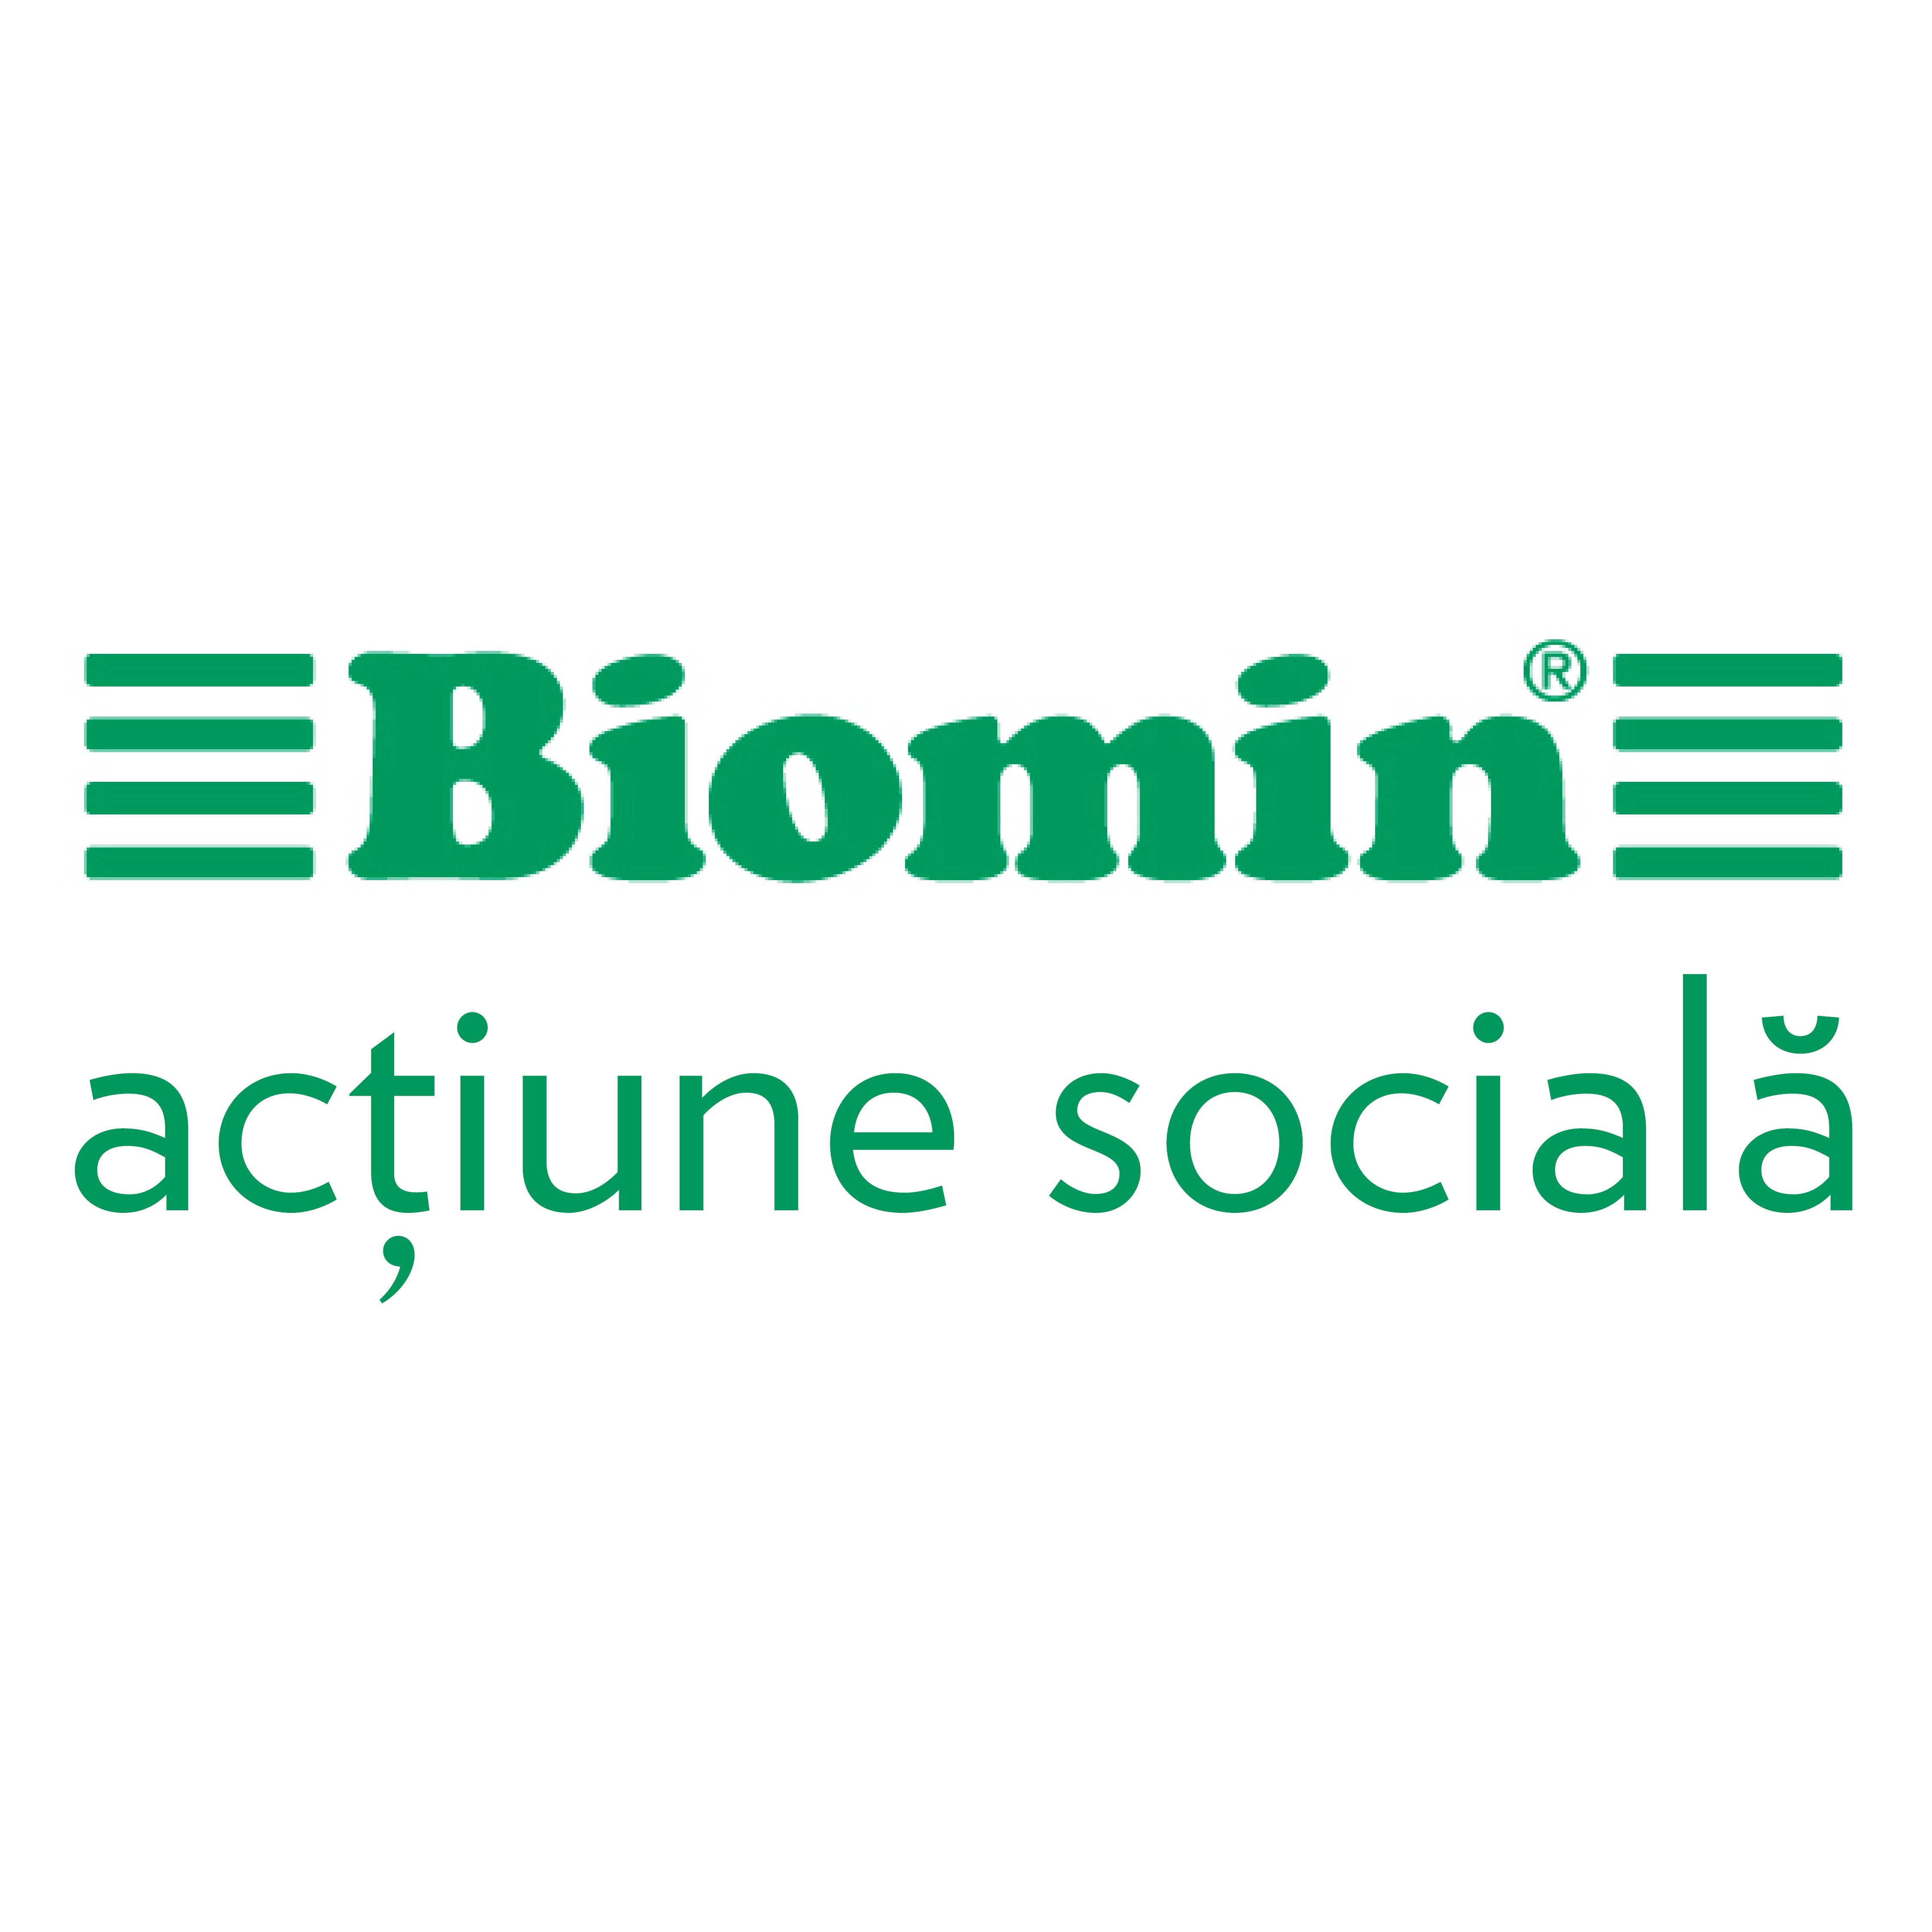 Biomin actiune sociala